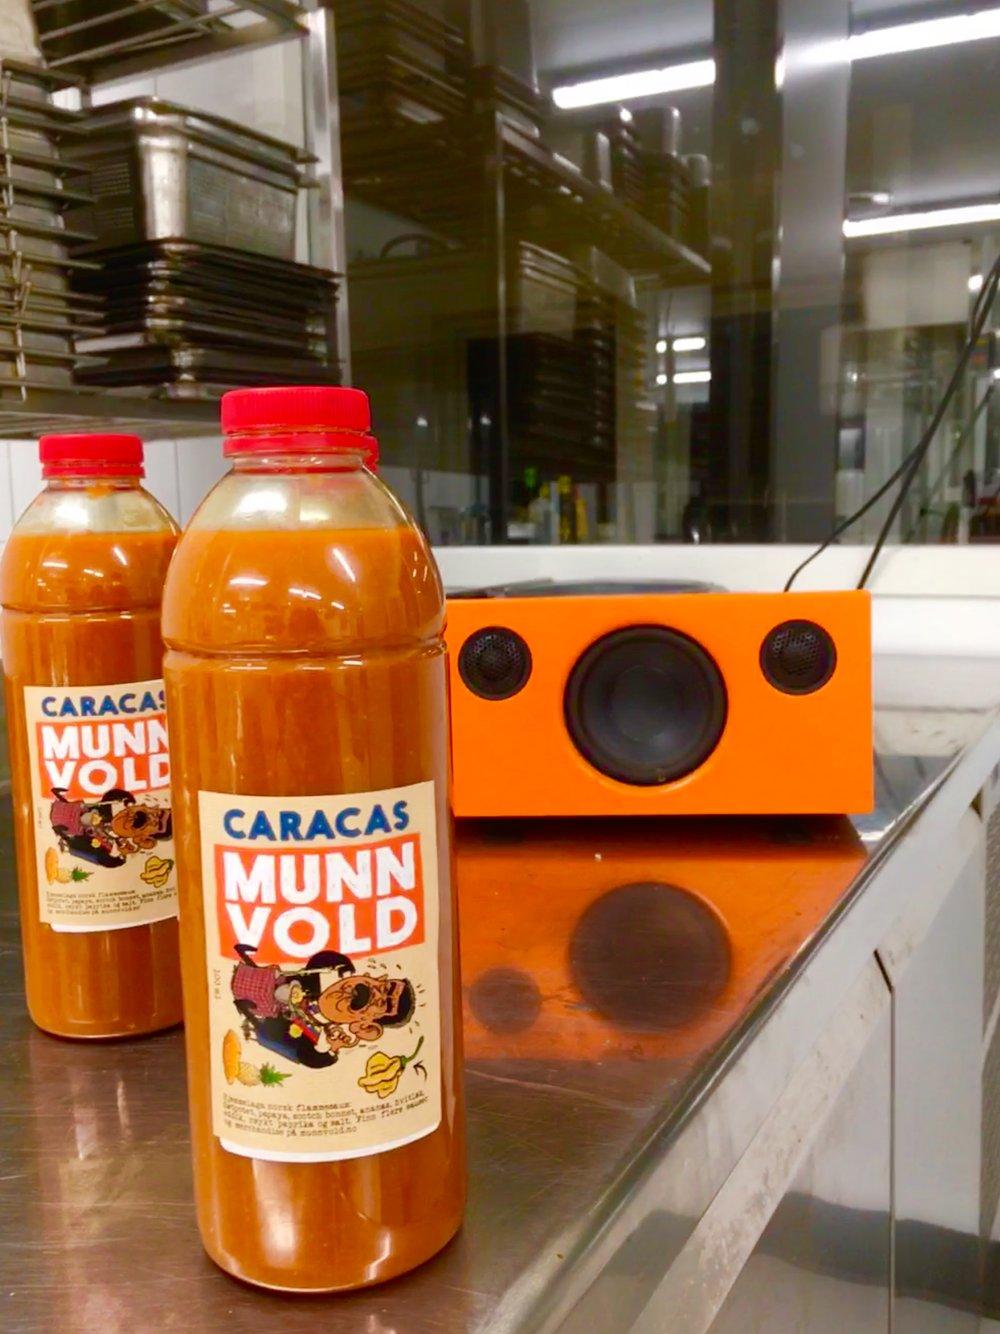 Image of Munnvold Caracas 1 liter